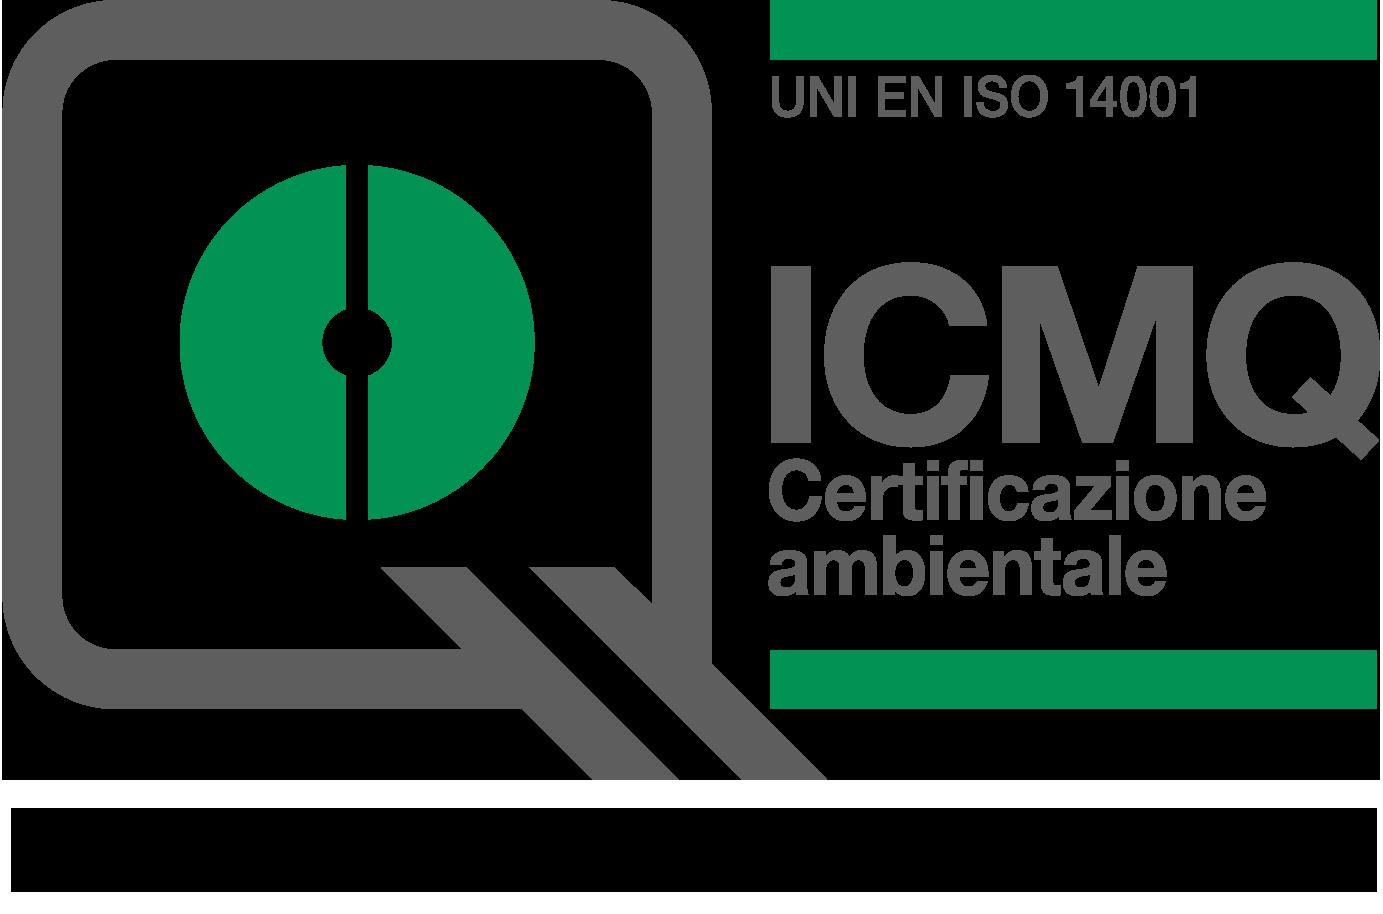 environment certification